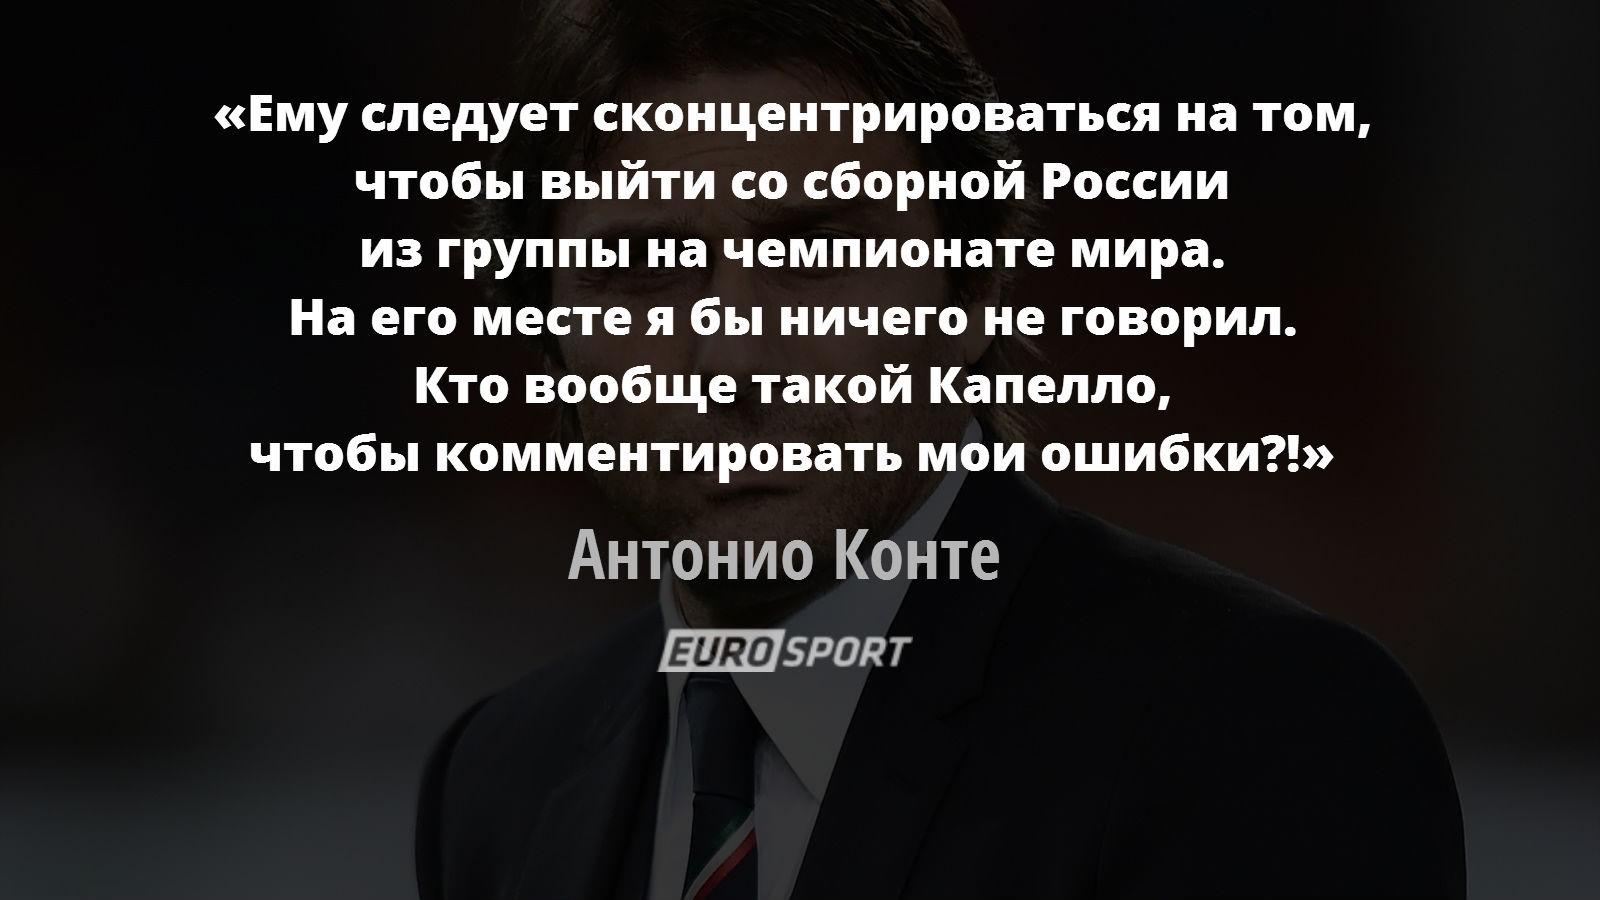 https://i.eurosport.com/2015/07/13/1639194.jpg